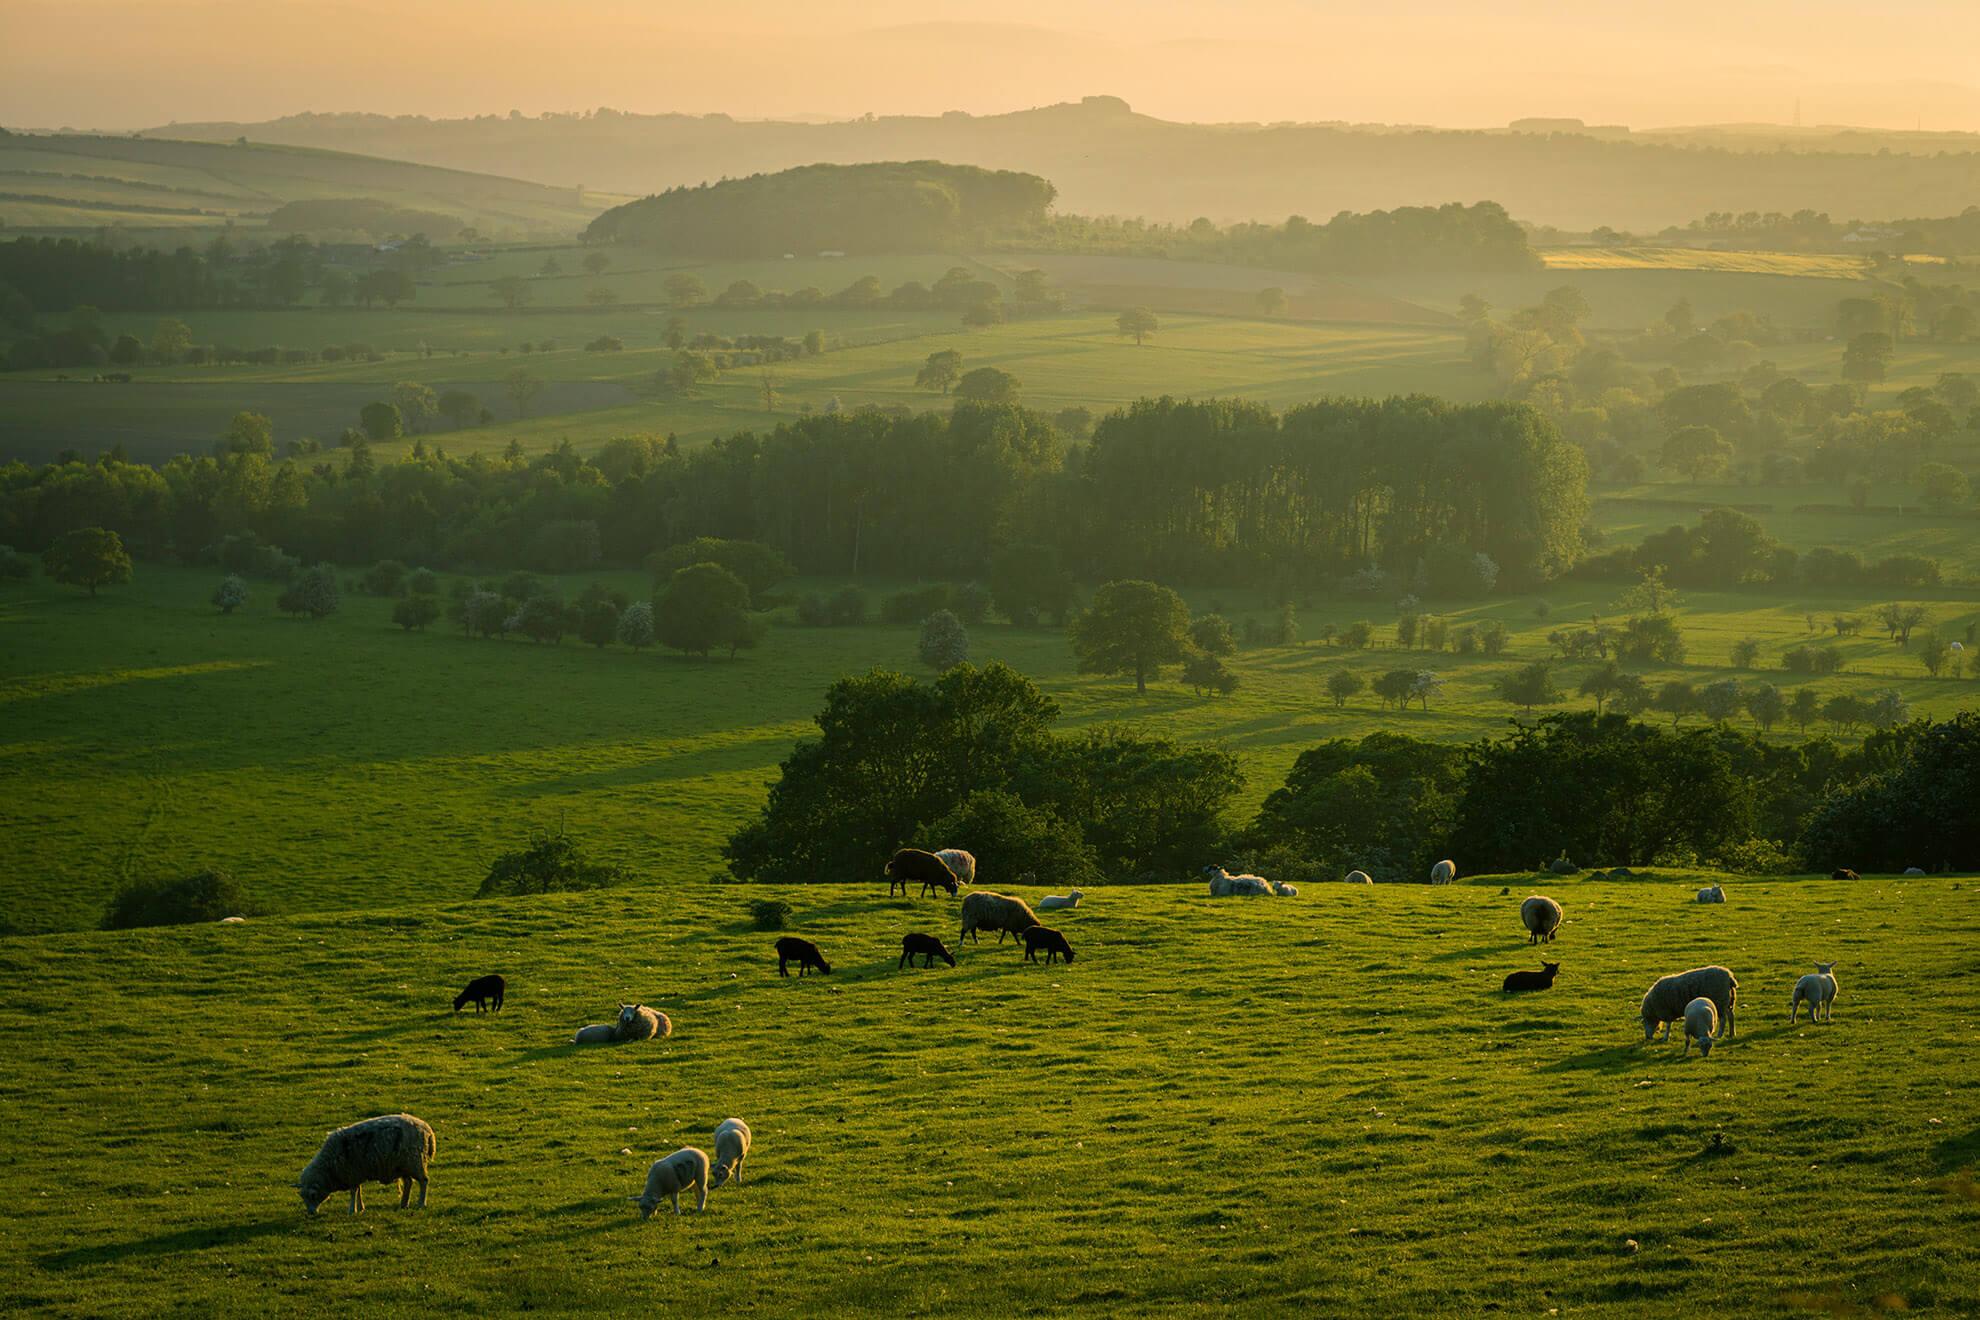 A field of grazing livestock.